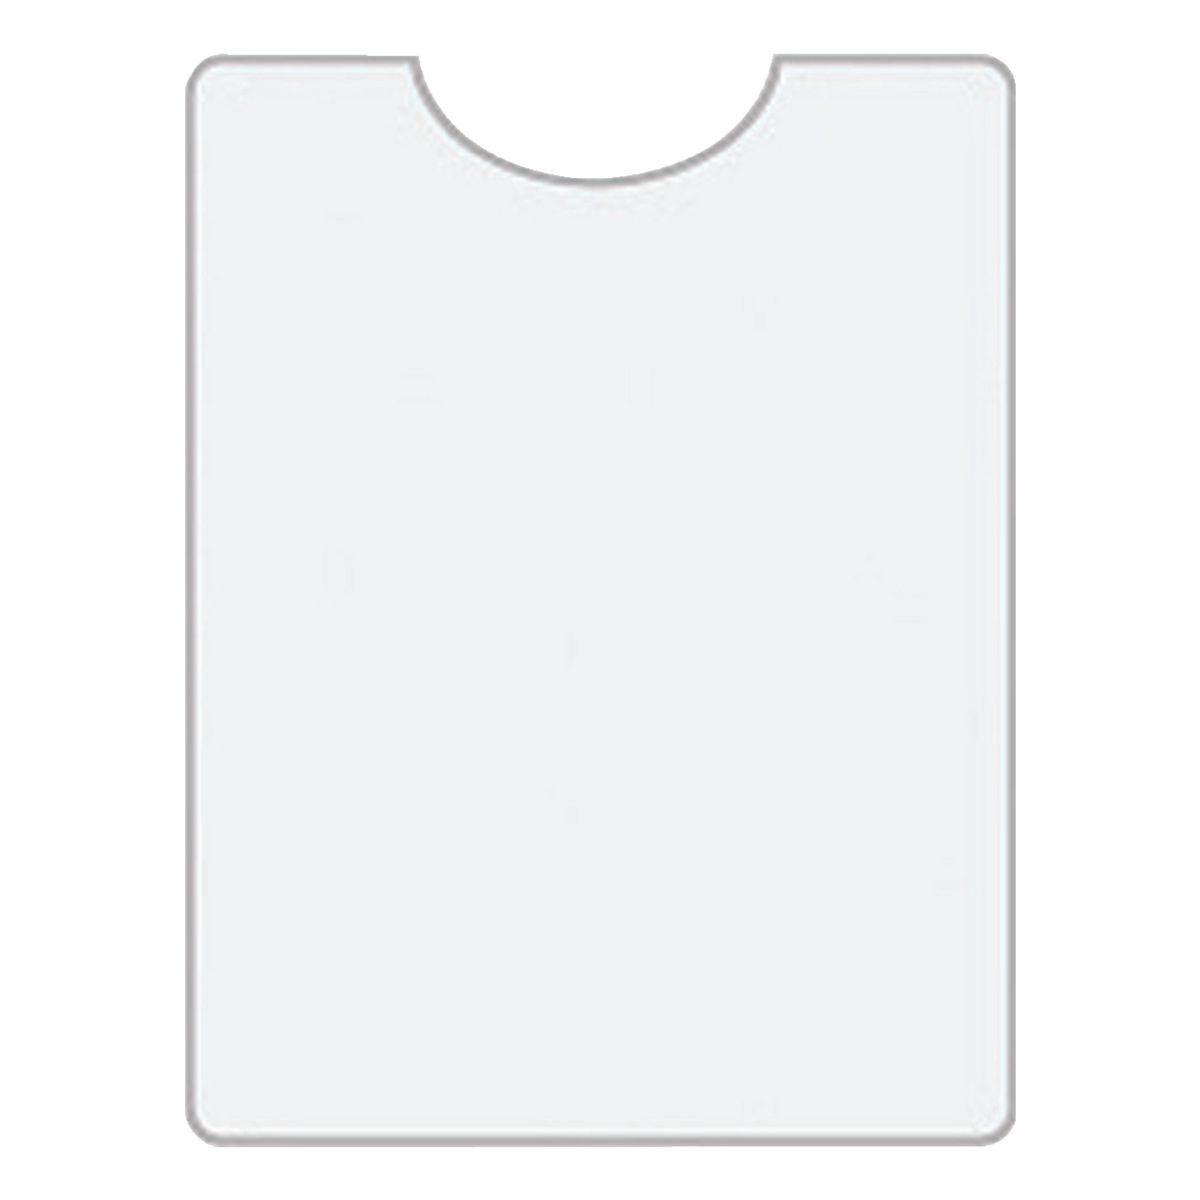 OTTO Office Standard Kreditkartenhülle